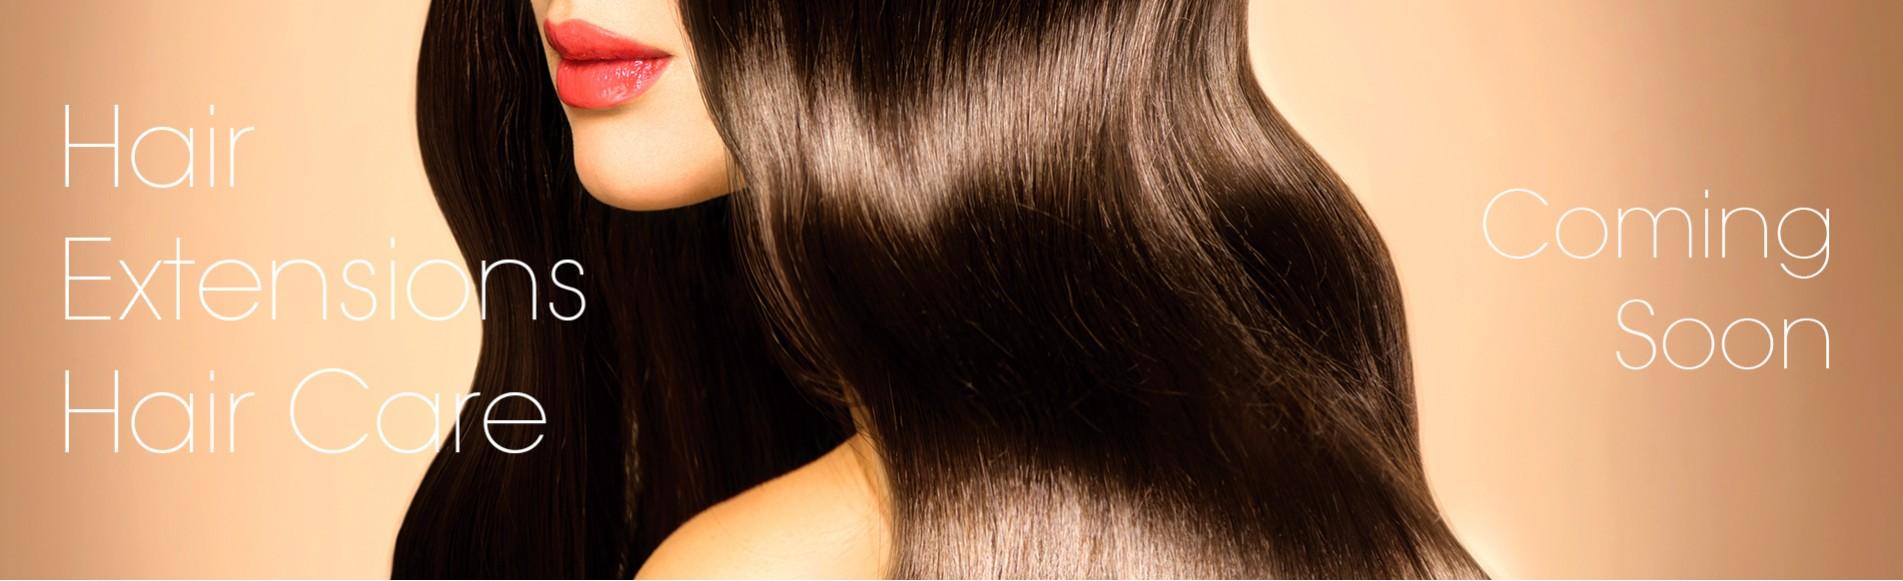 Hair Extensions Hair Care